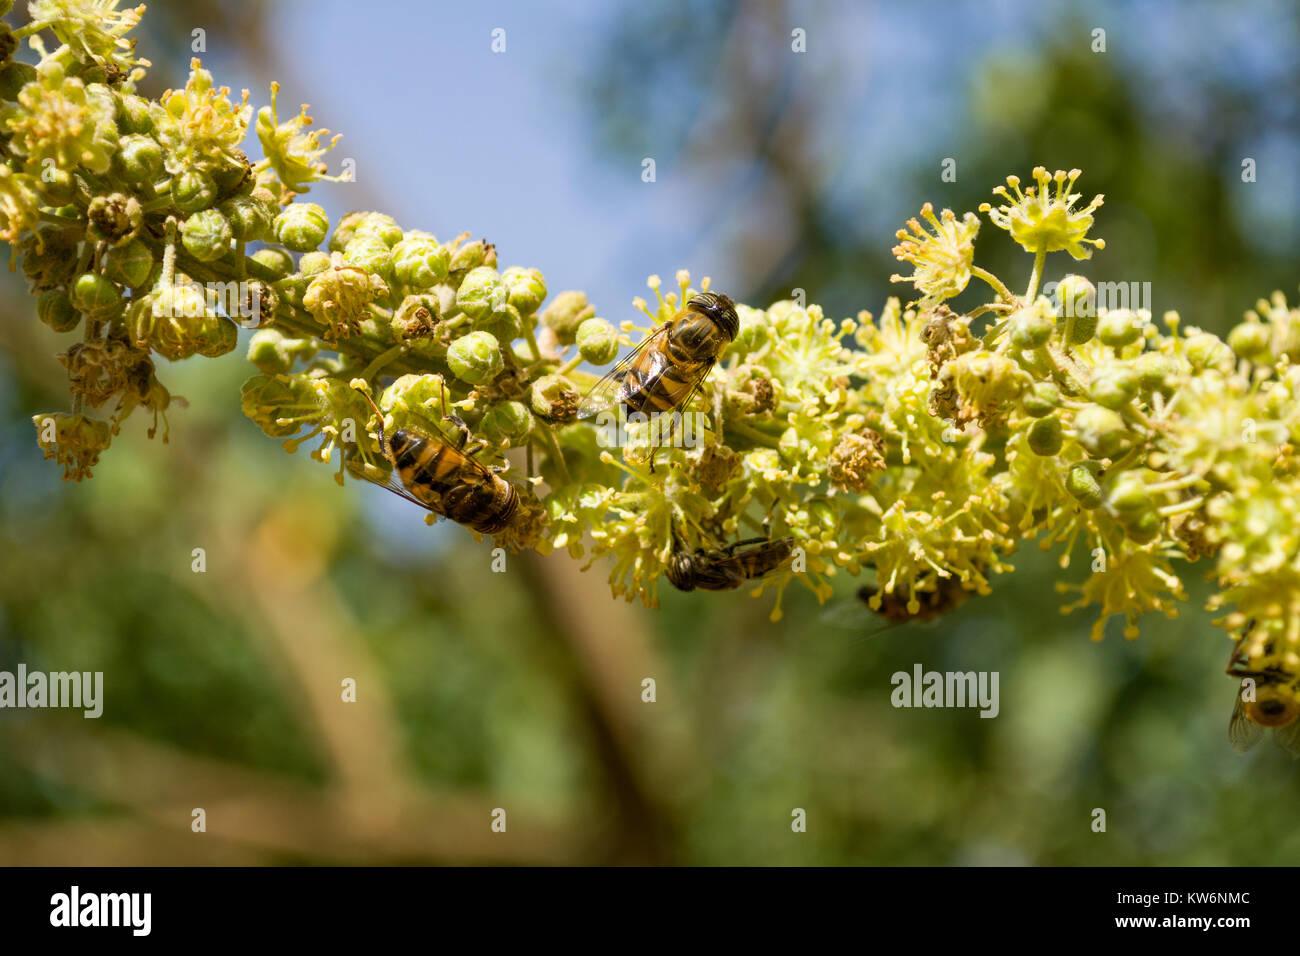 Honey bee mimic or Band-eyed drone fly (Eristalinus Taeniops) feeding on nectar from a flower, Nairobi, Kenya, East - Stock Image